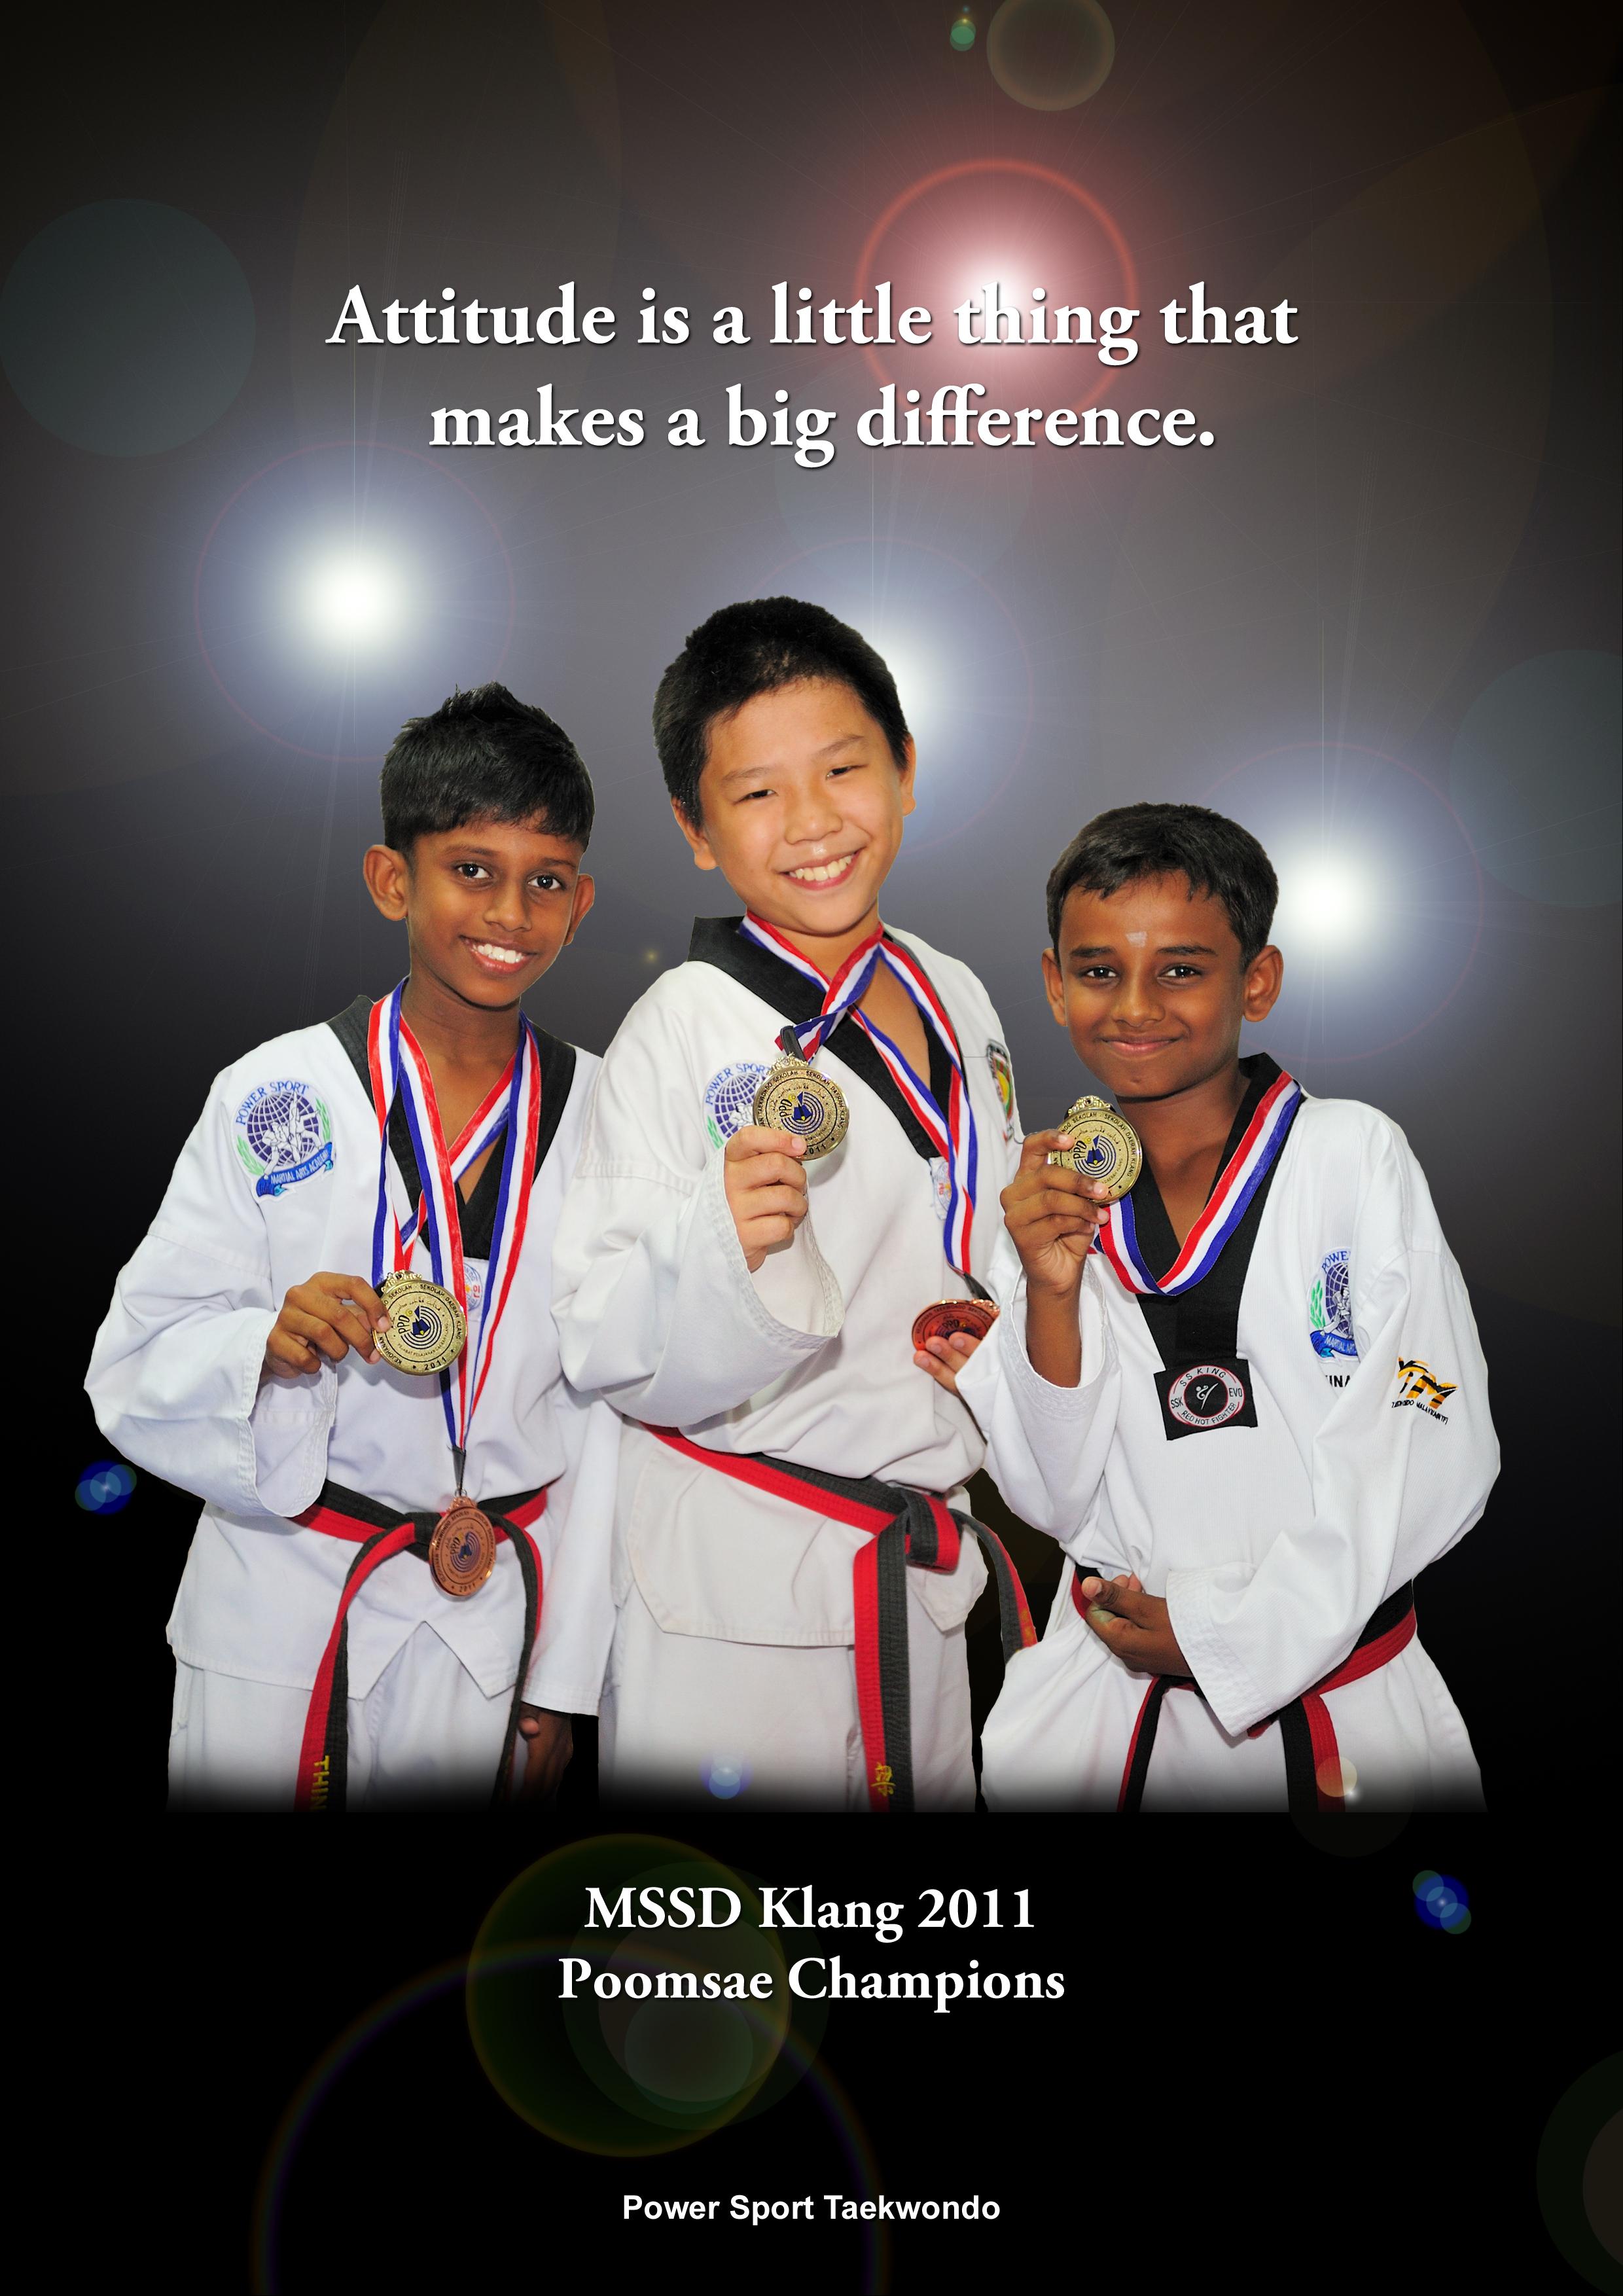 Taekwondo Quotes Another Inspirational Poster  Power Sport Taekwondo